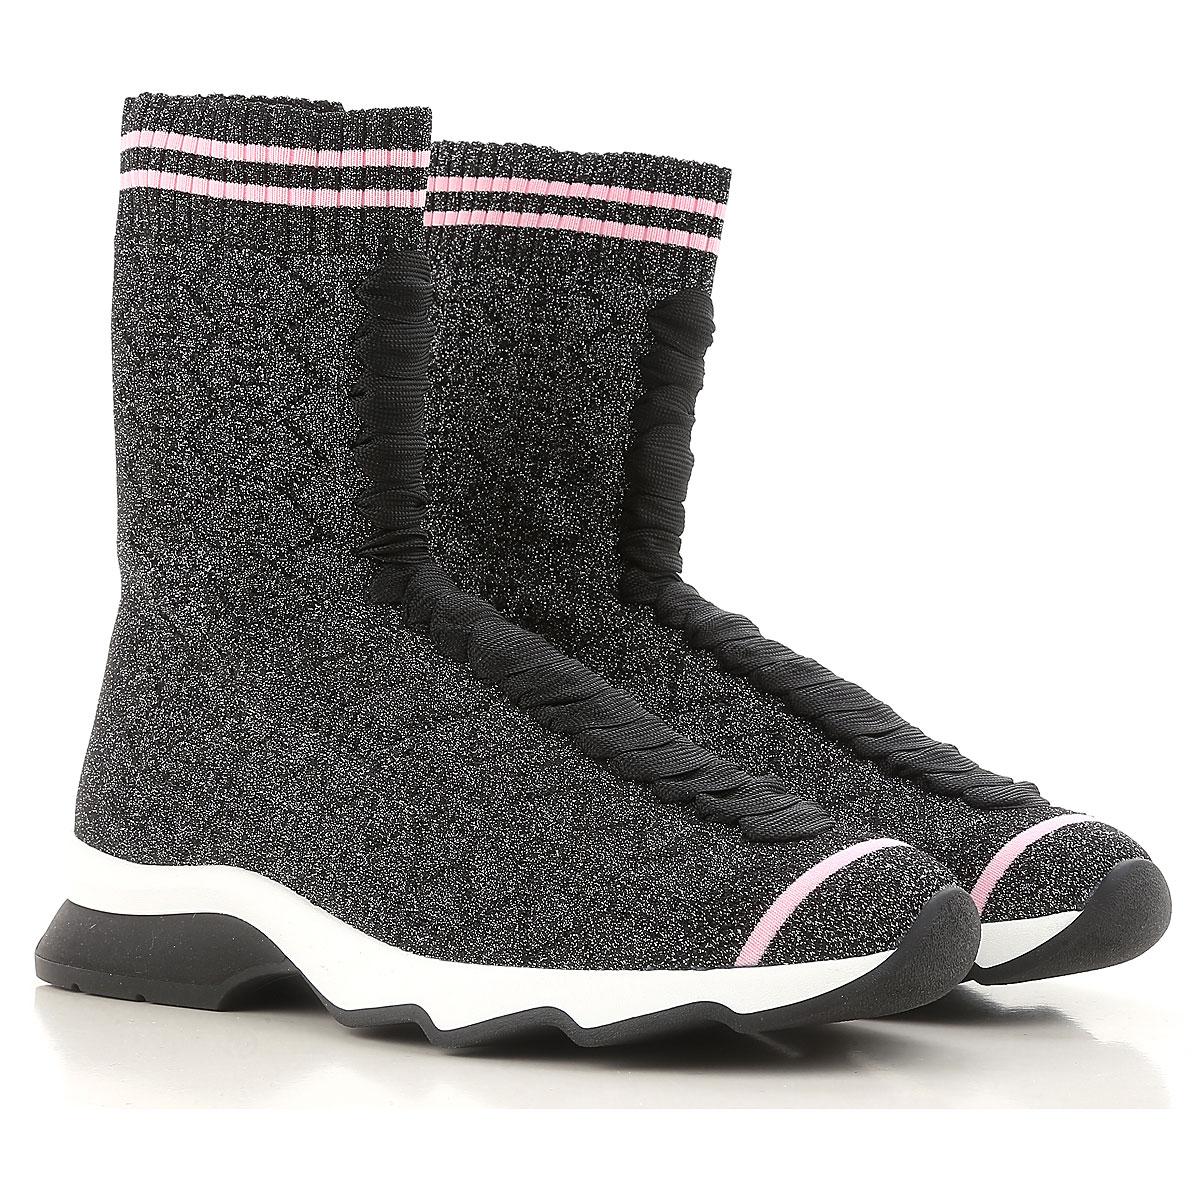 Offerte Limitate Fendi Scarpe Sneakers Donna